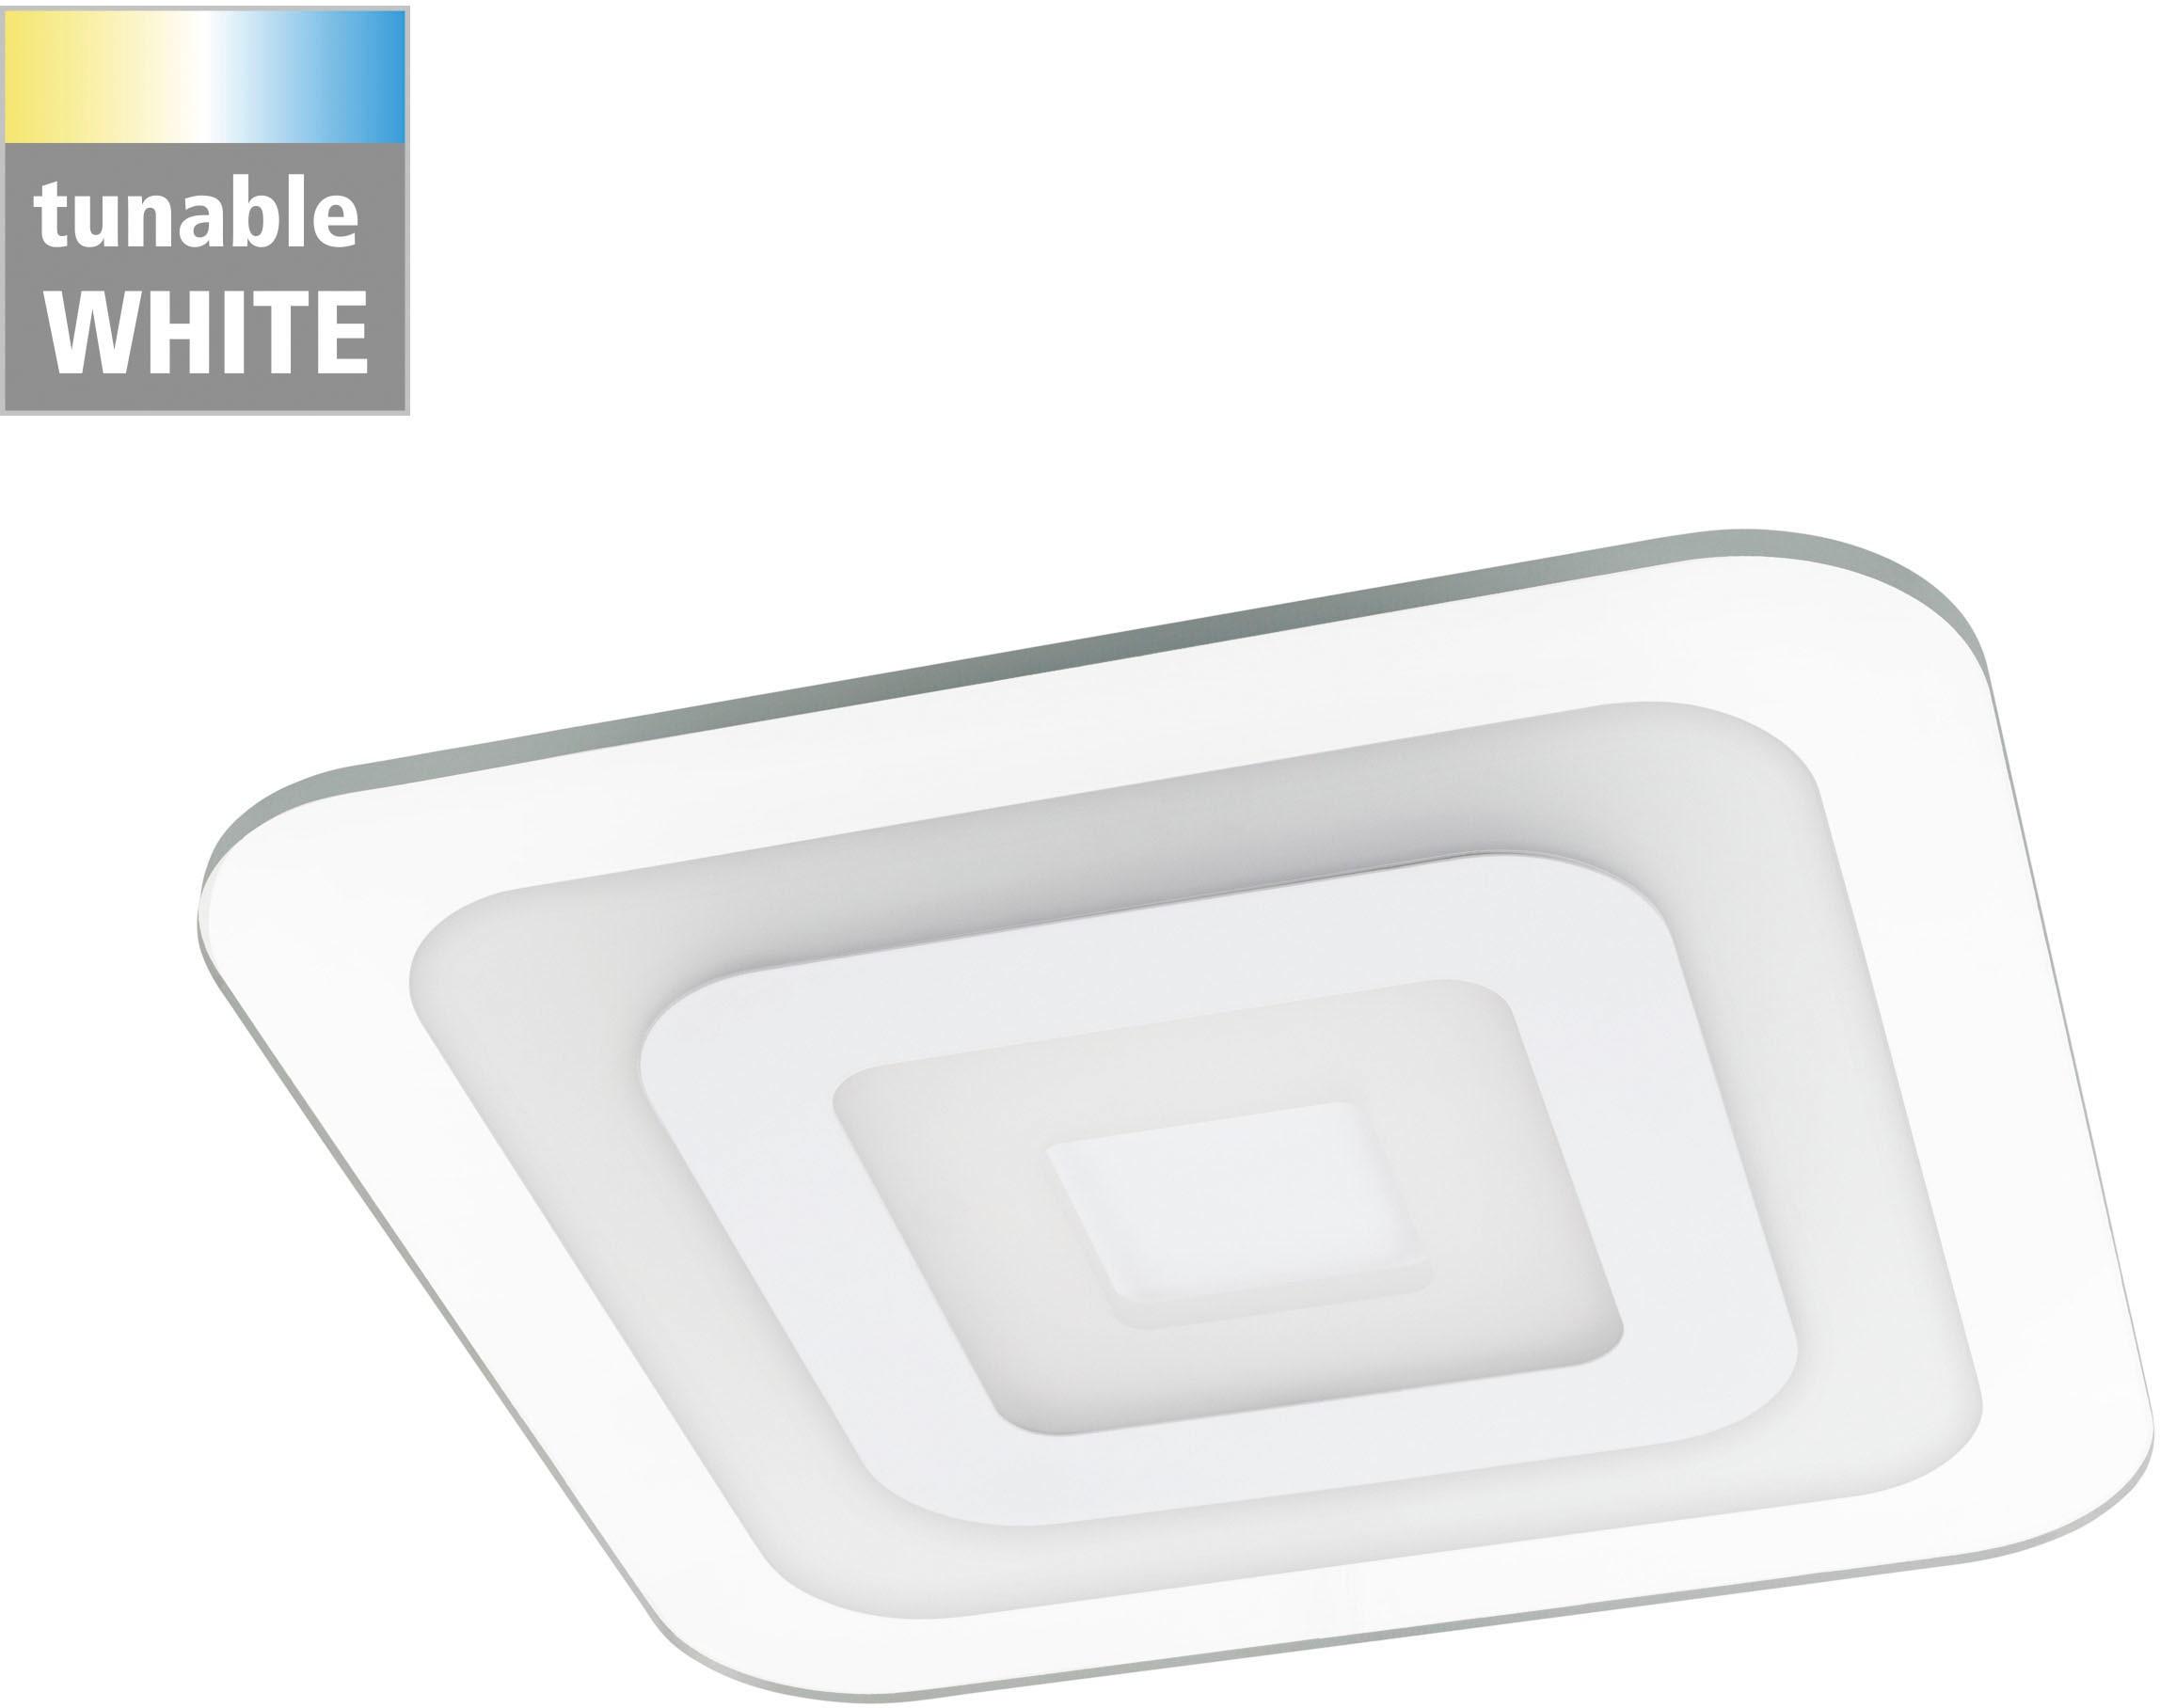 EGLO LED Deckenleuchte REDUCTA 1, LED-Board, Extra-Warmweiß-Kaltweiß-Neutralweiß-Tageslichtweiß-Warmweiß, Memory function, CCT, 3-step dimming